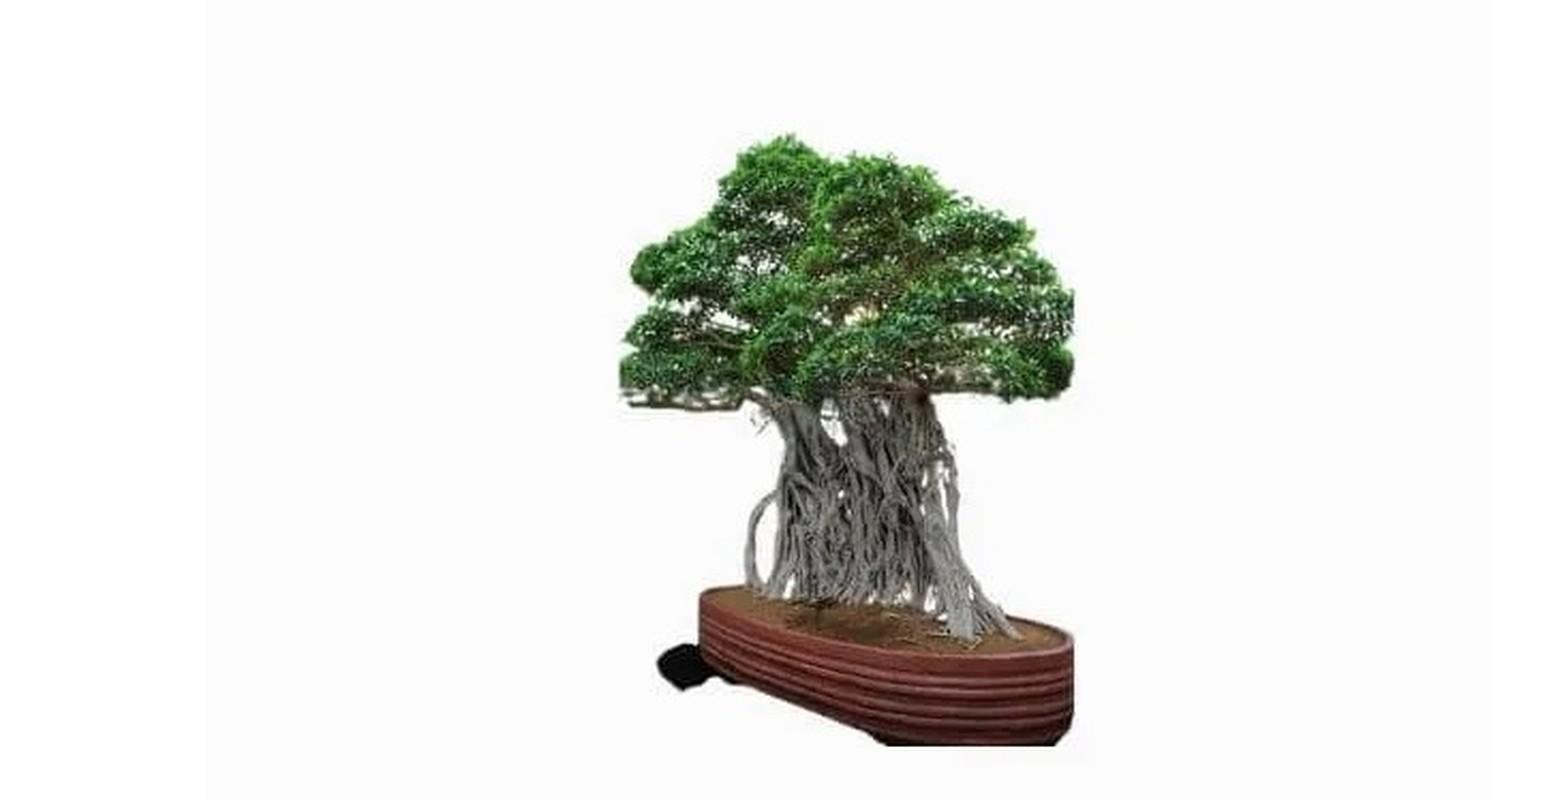 Man nhan loat sieu pham bonsai nha giau co tien cung kho mua-Hinh-4